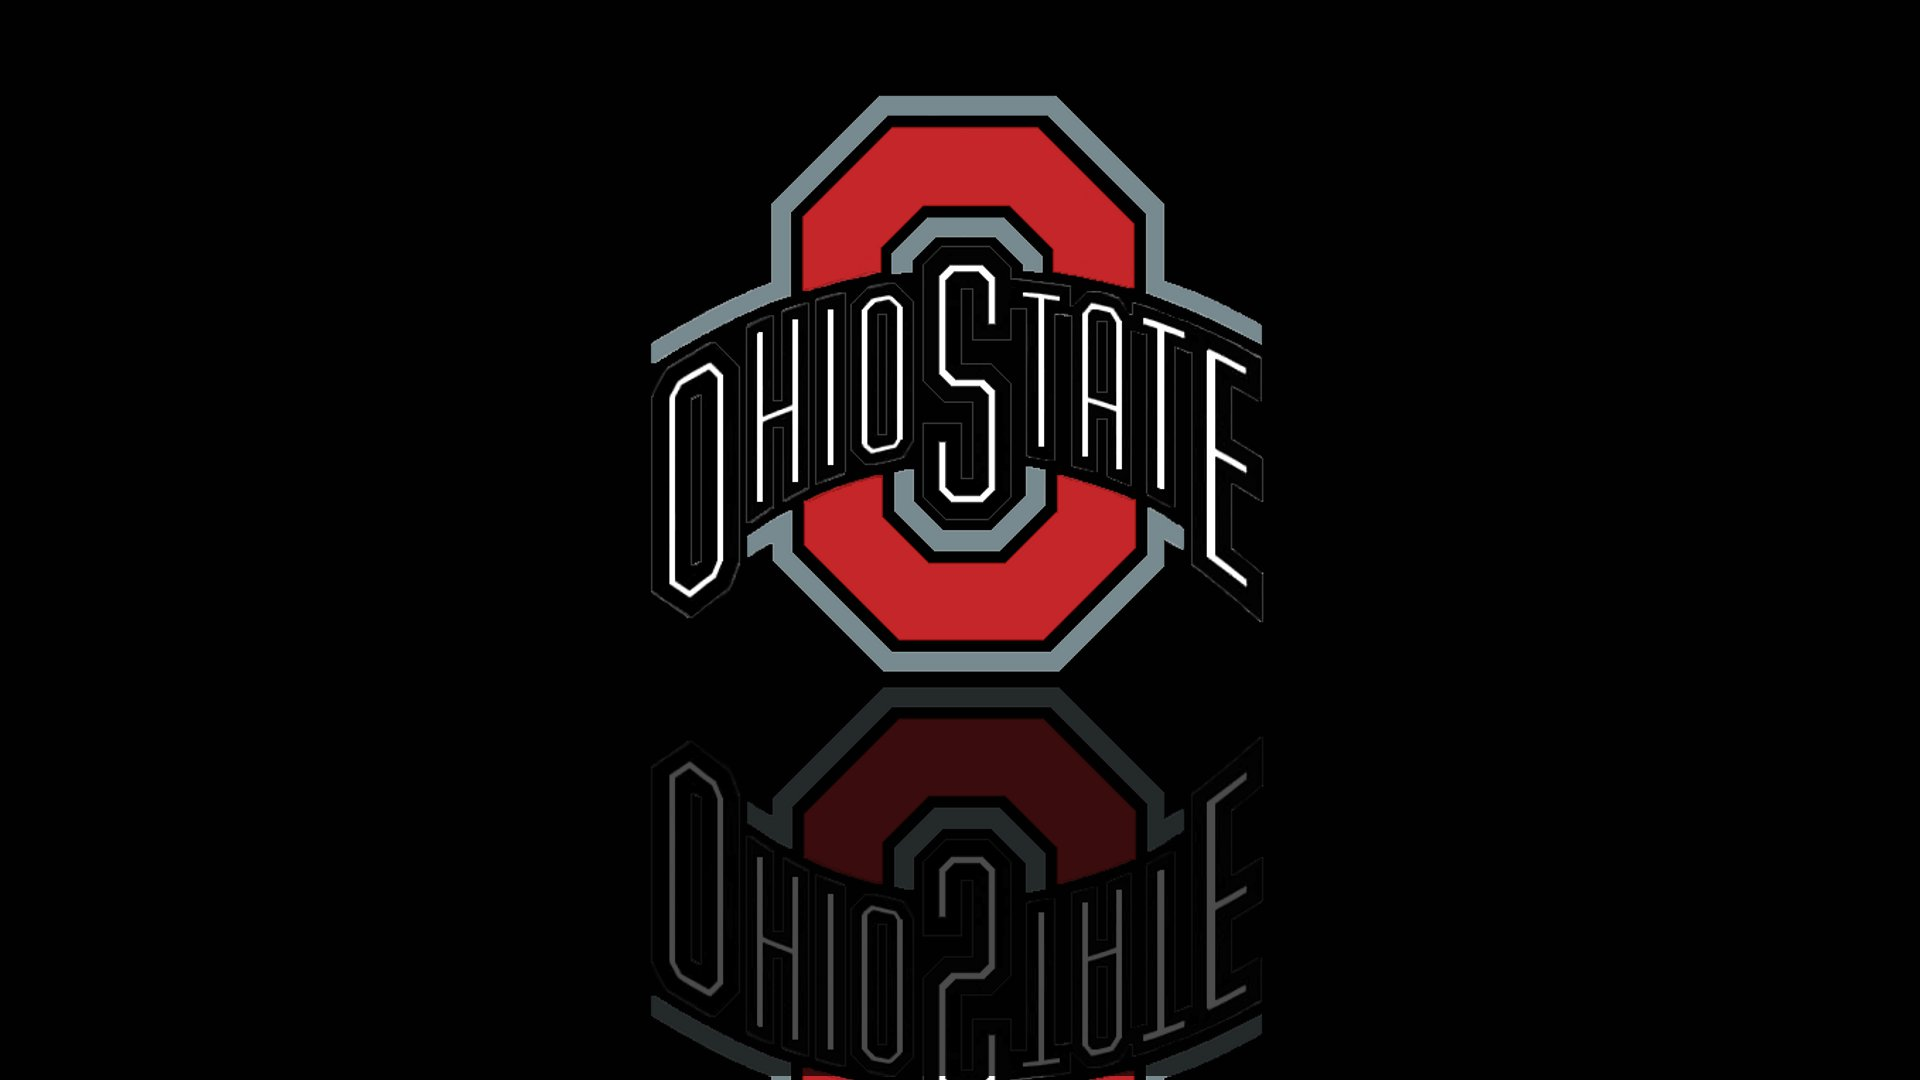 Ohio State 2   Ohio State Football Wallpaper 28723995 1920x1080